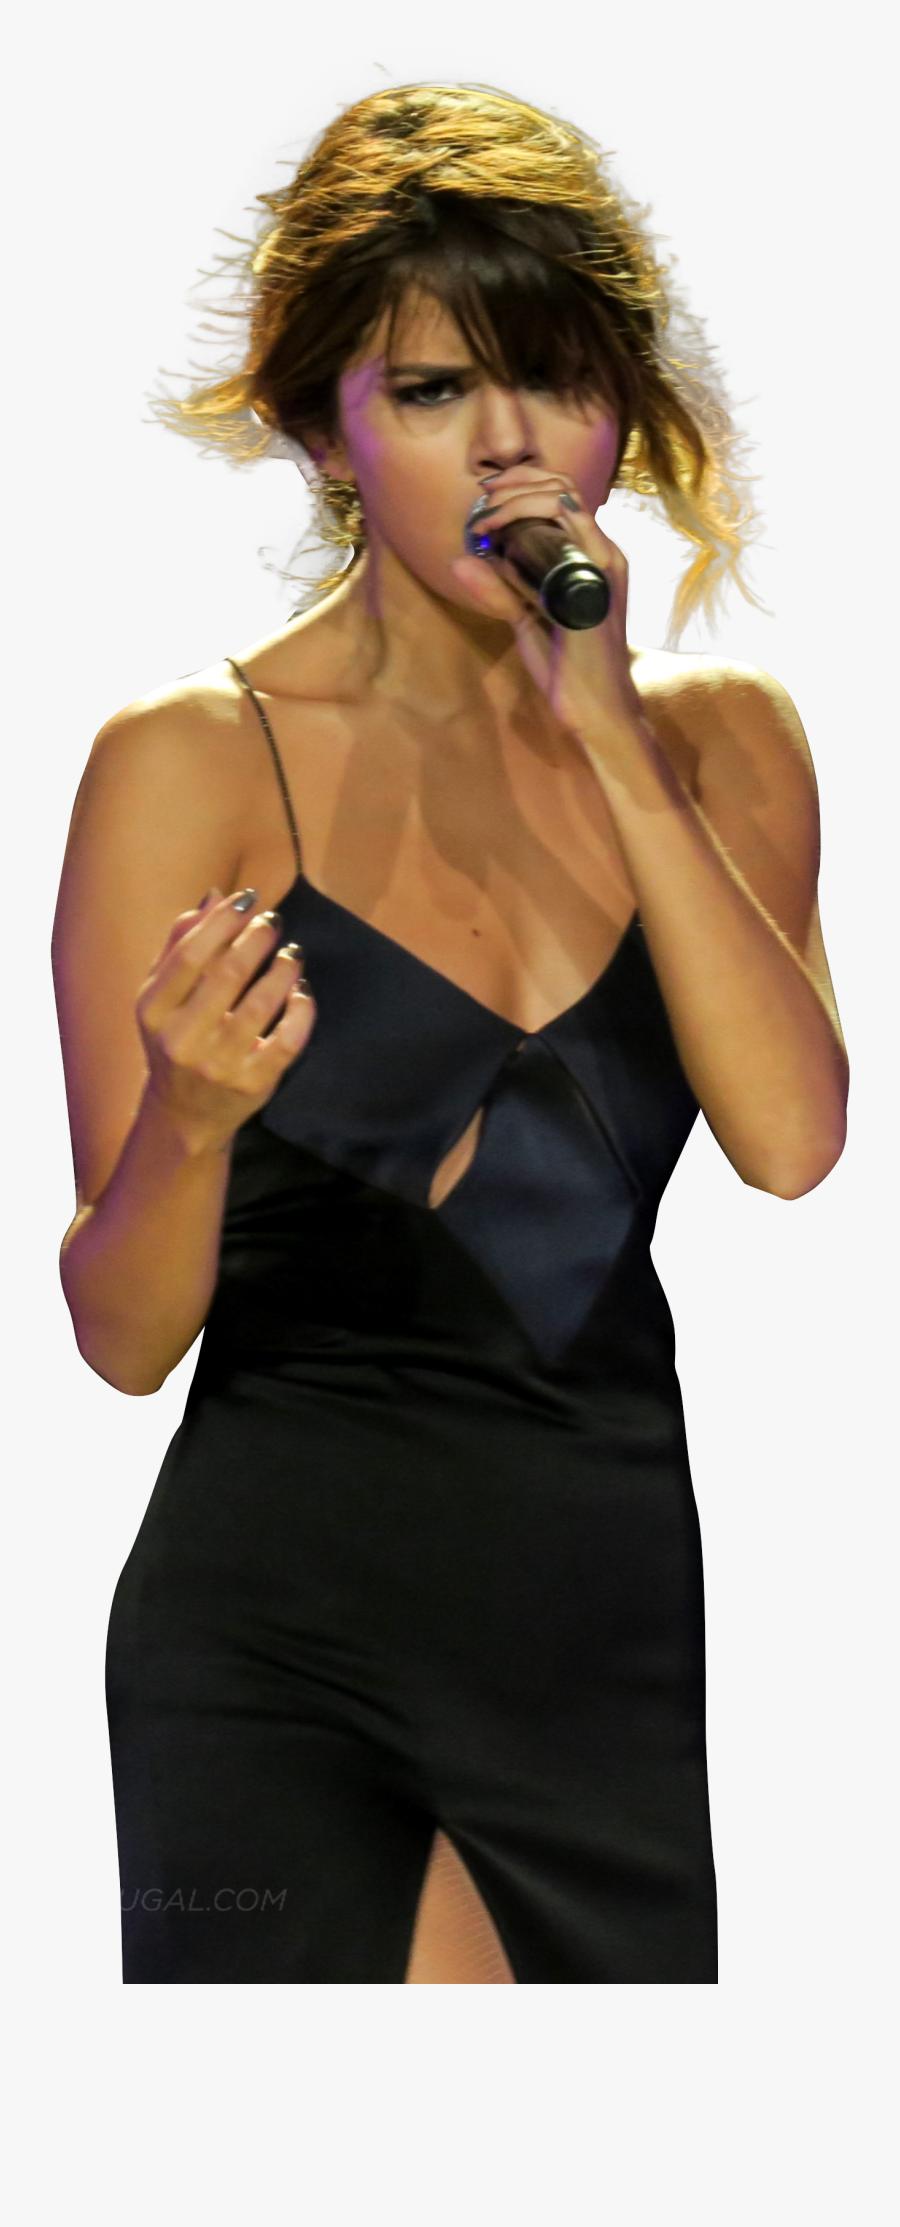 Selena Gomez Singing On Stage Png Image - Selena Gomez Singing Png, Transparent Clipart